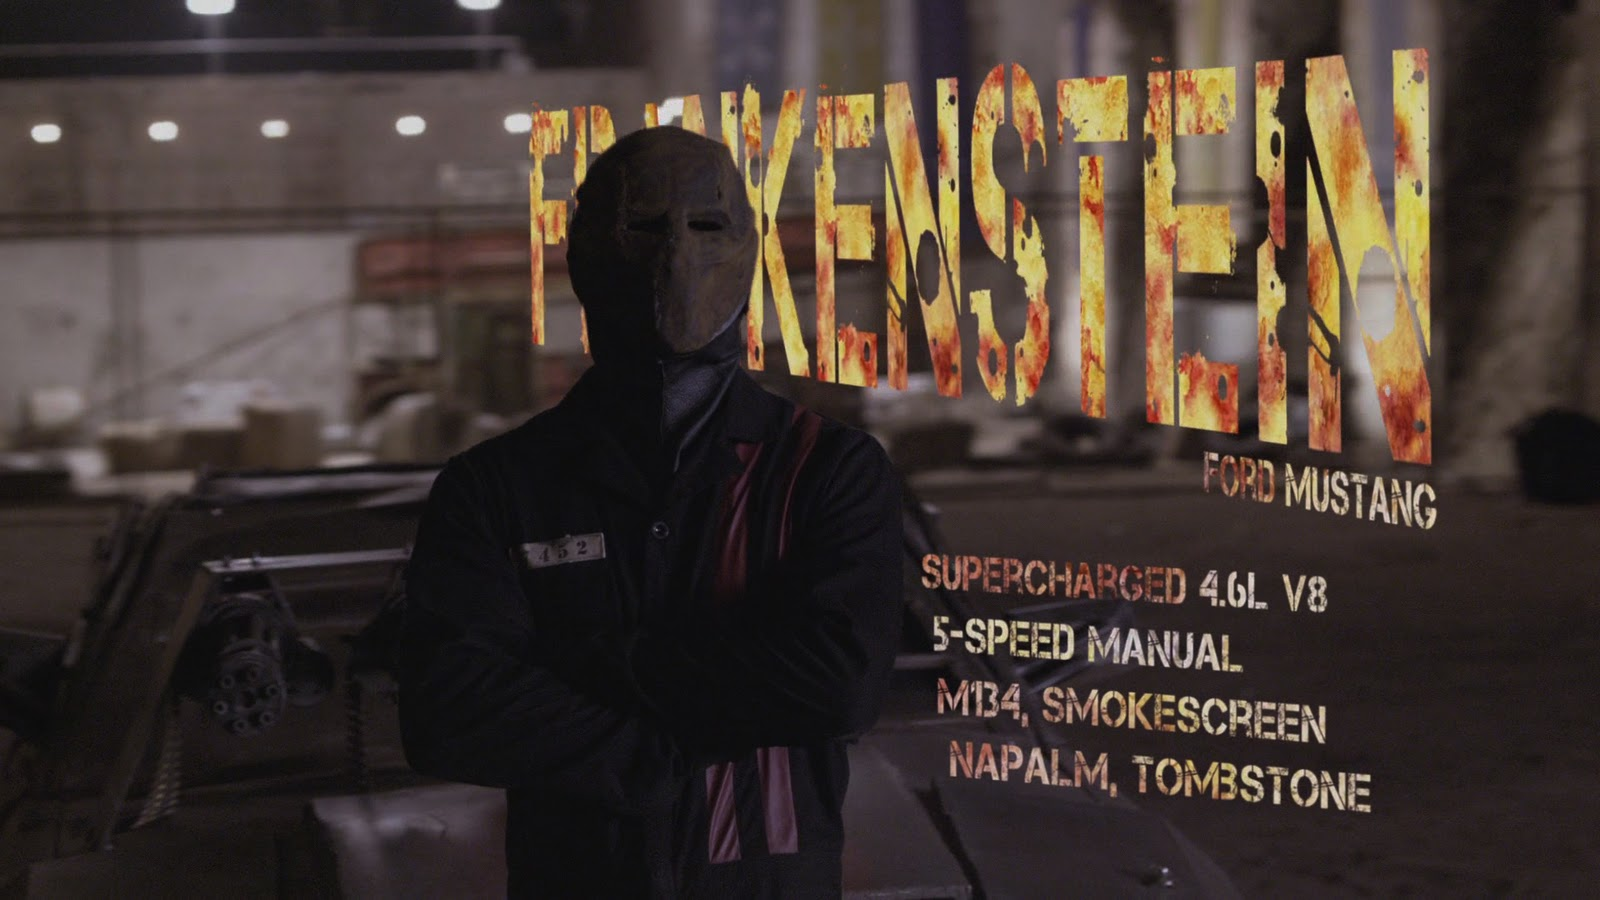 http://1.bp.blogspot.com/_Kpi0thIqeJI/TRy3iwd_OPI/AAAAAAAABJ4/EcjfpLMjQkk/s1600/death+race+2+2010+-+freehd.blogspot+%25283%2529.JPG